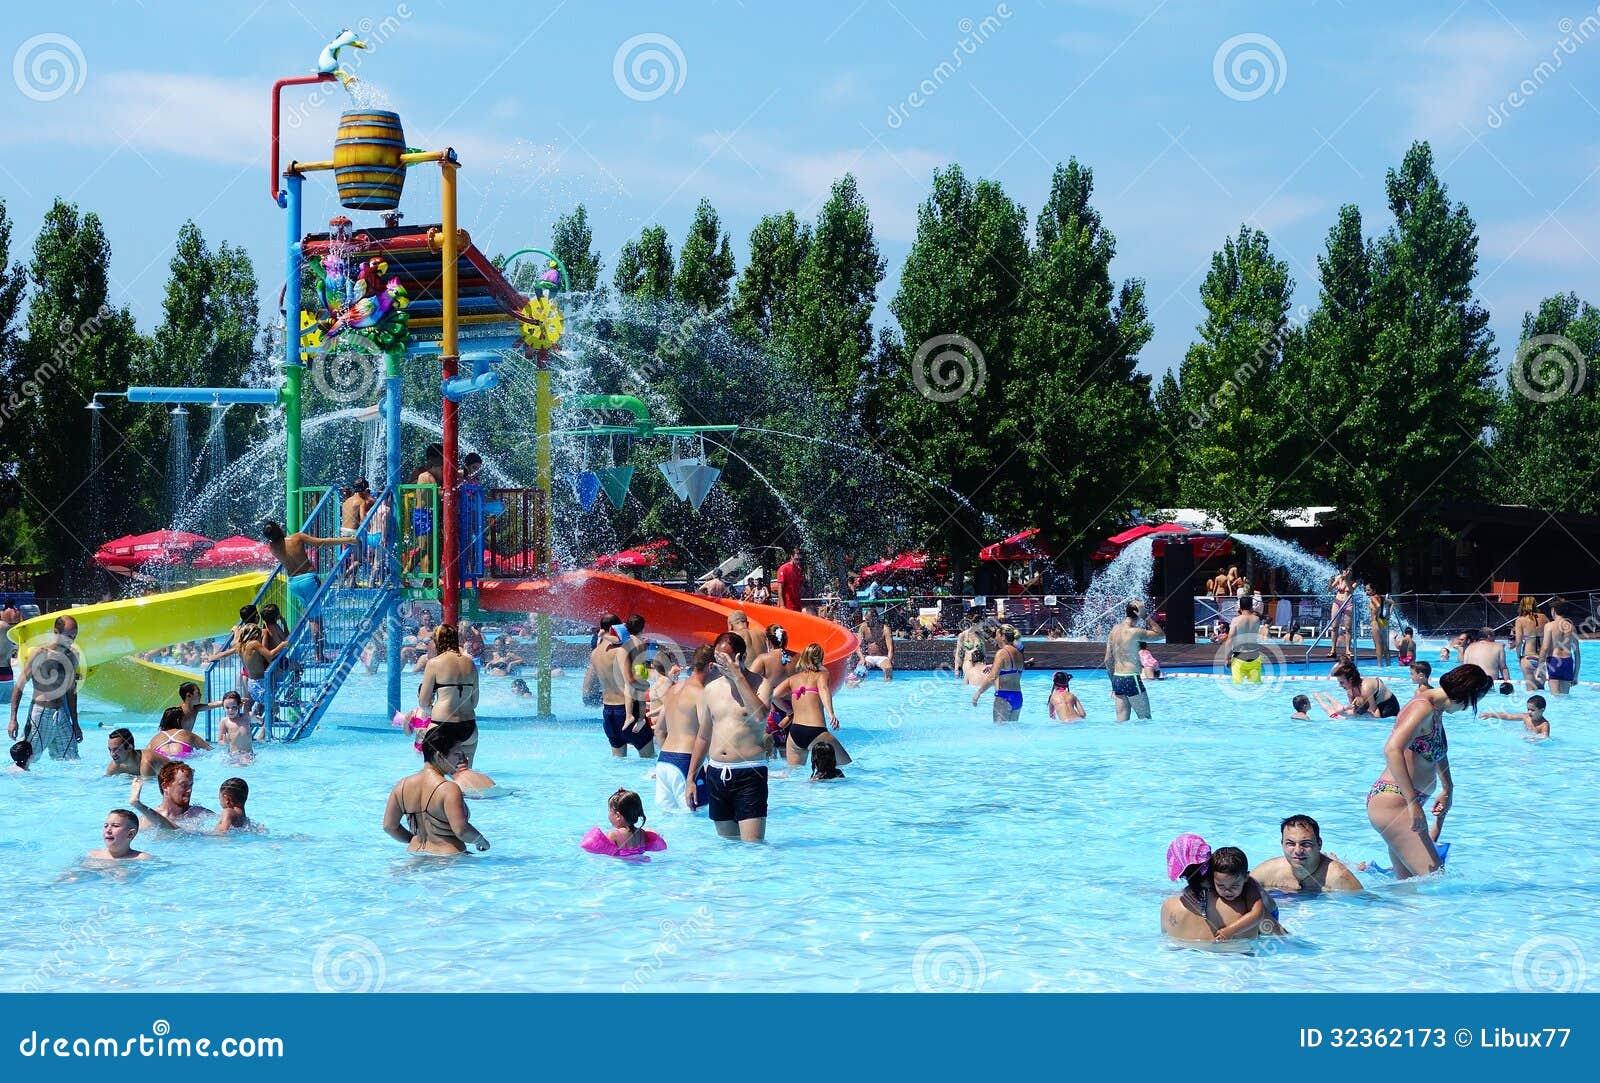 Fun At Water Park Editorial Stock Photo Image Of Waterpark 32362173